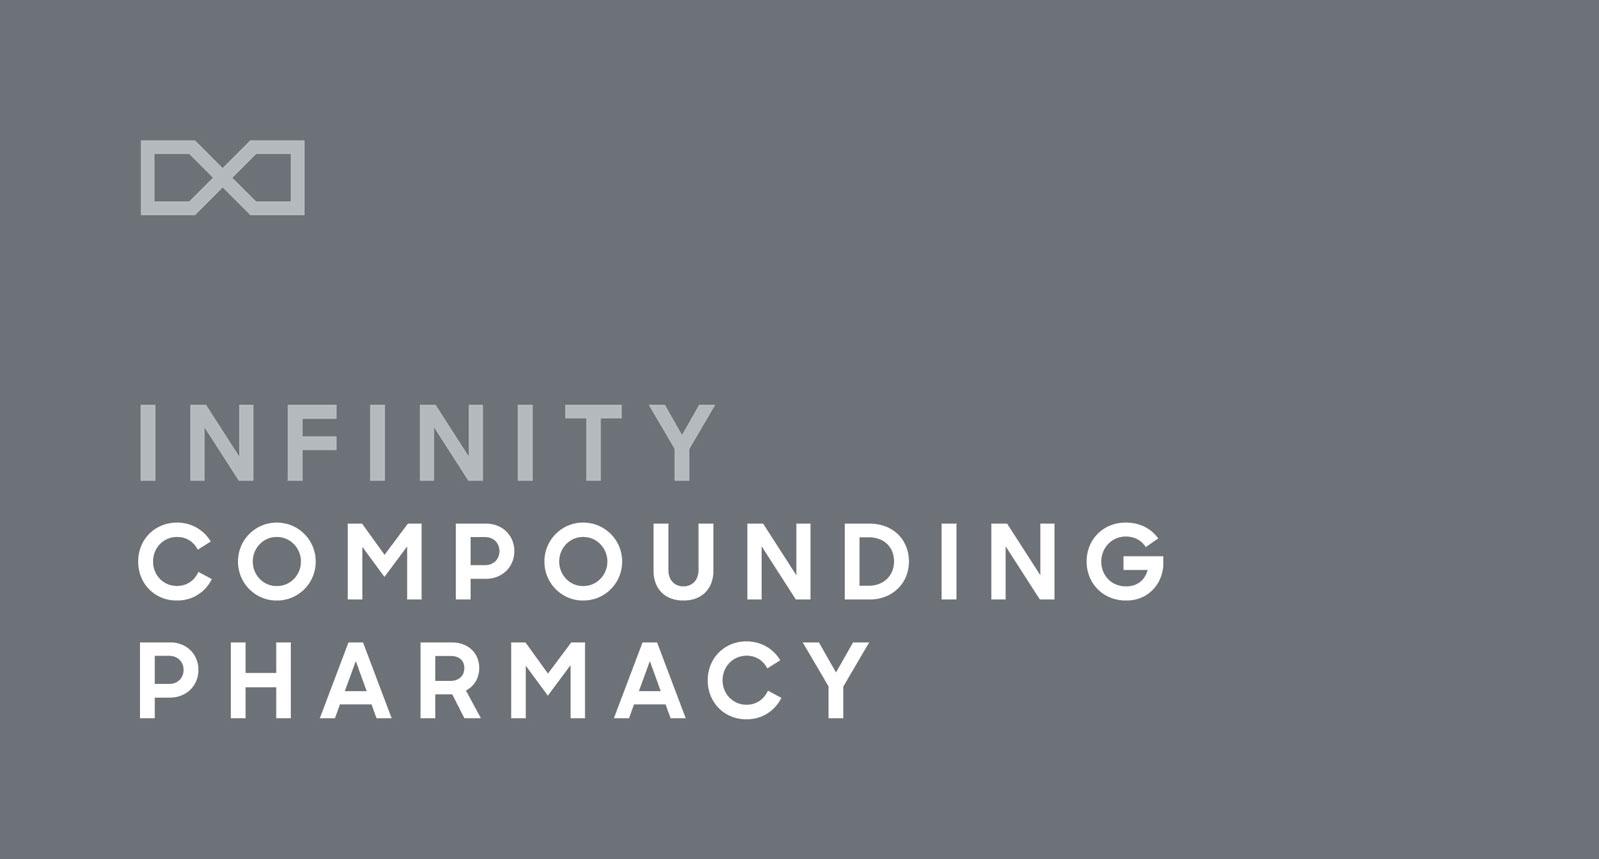 INFINITY_COMPOUNDING_PHARMACY__LOGO.jpg